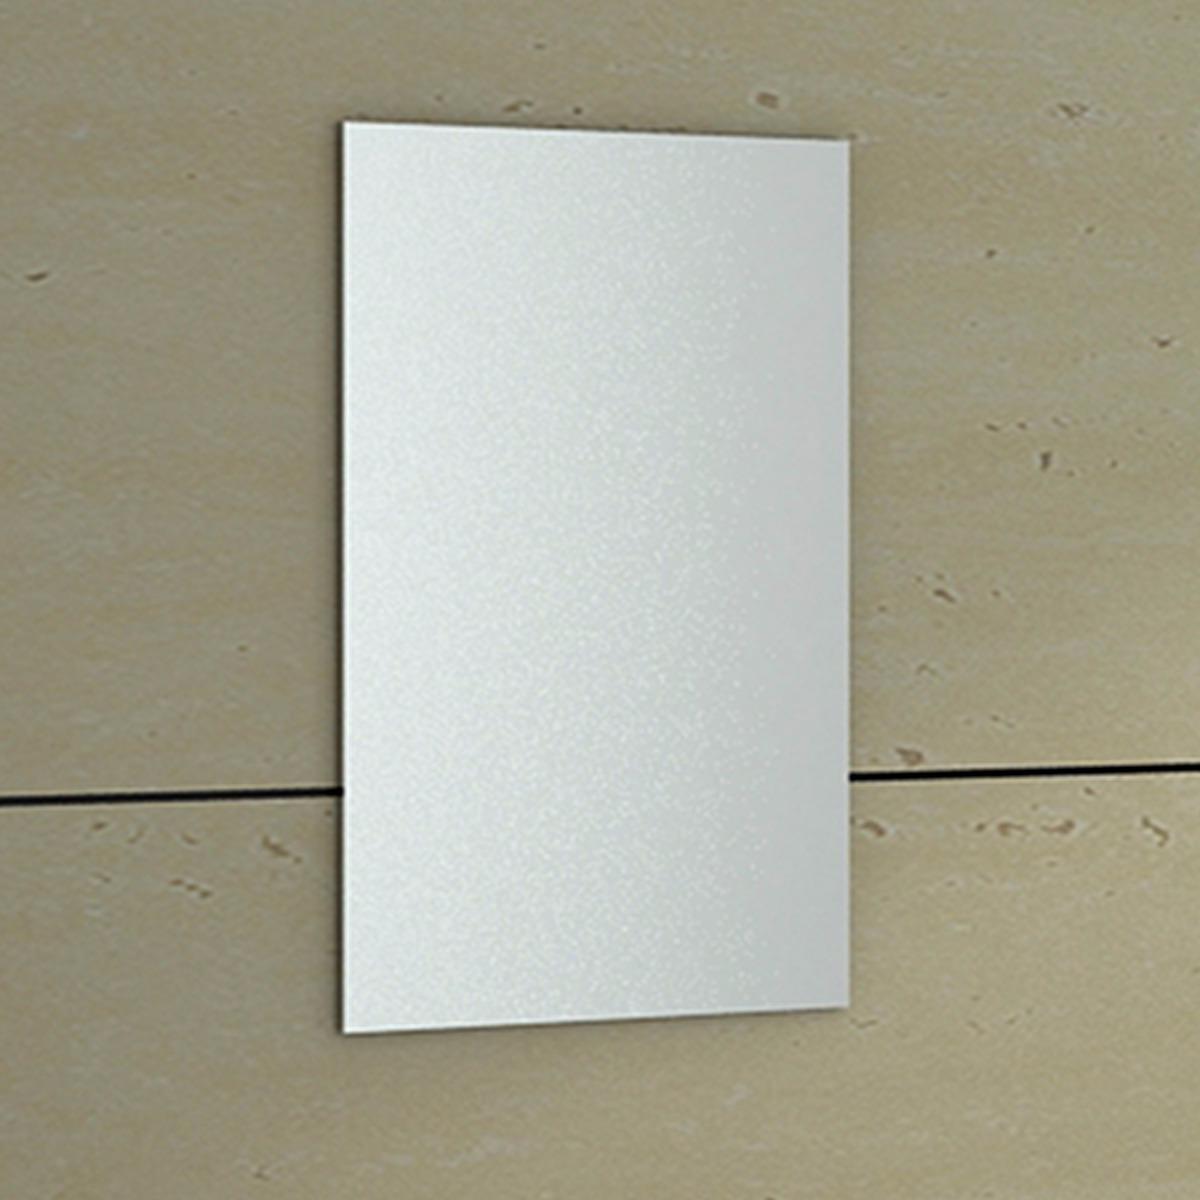 Miroir 40×50 Sans Cadre Akw Miroir Sans Cadre 600x450mm